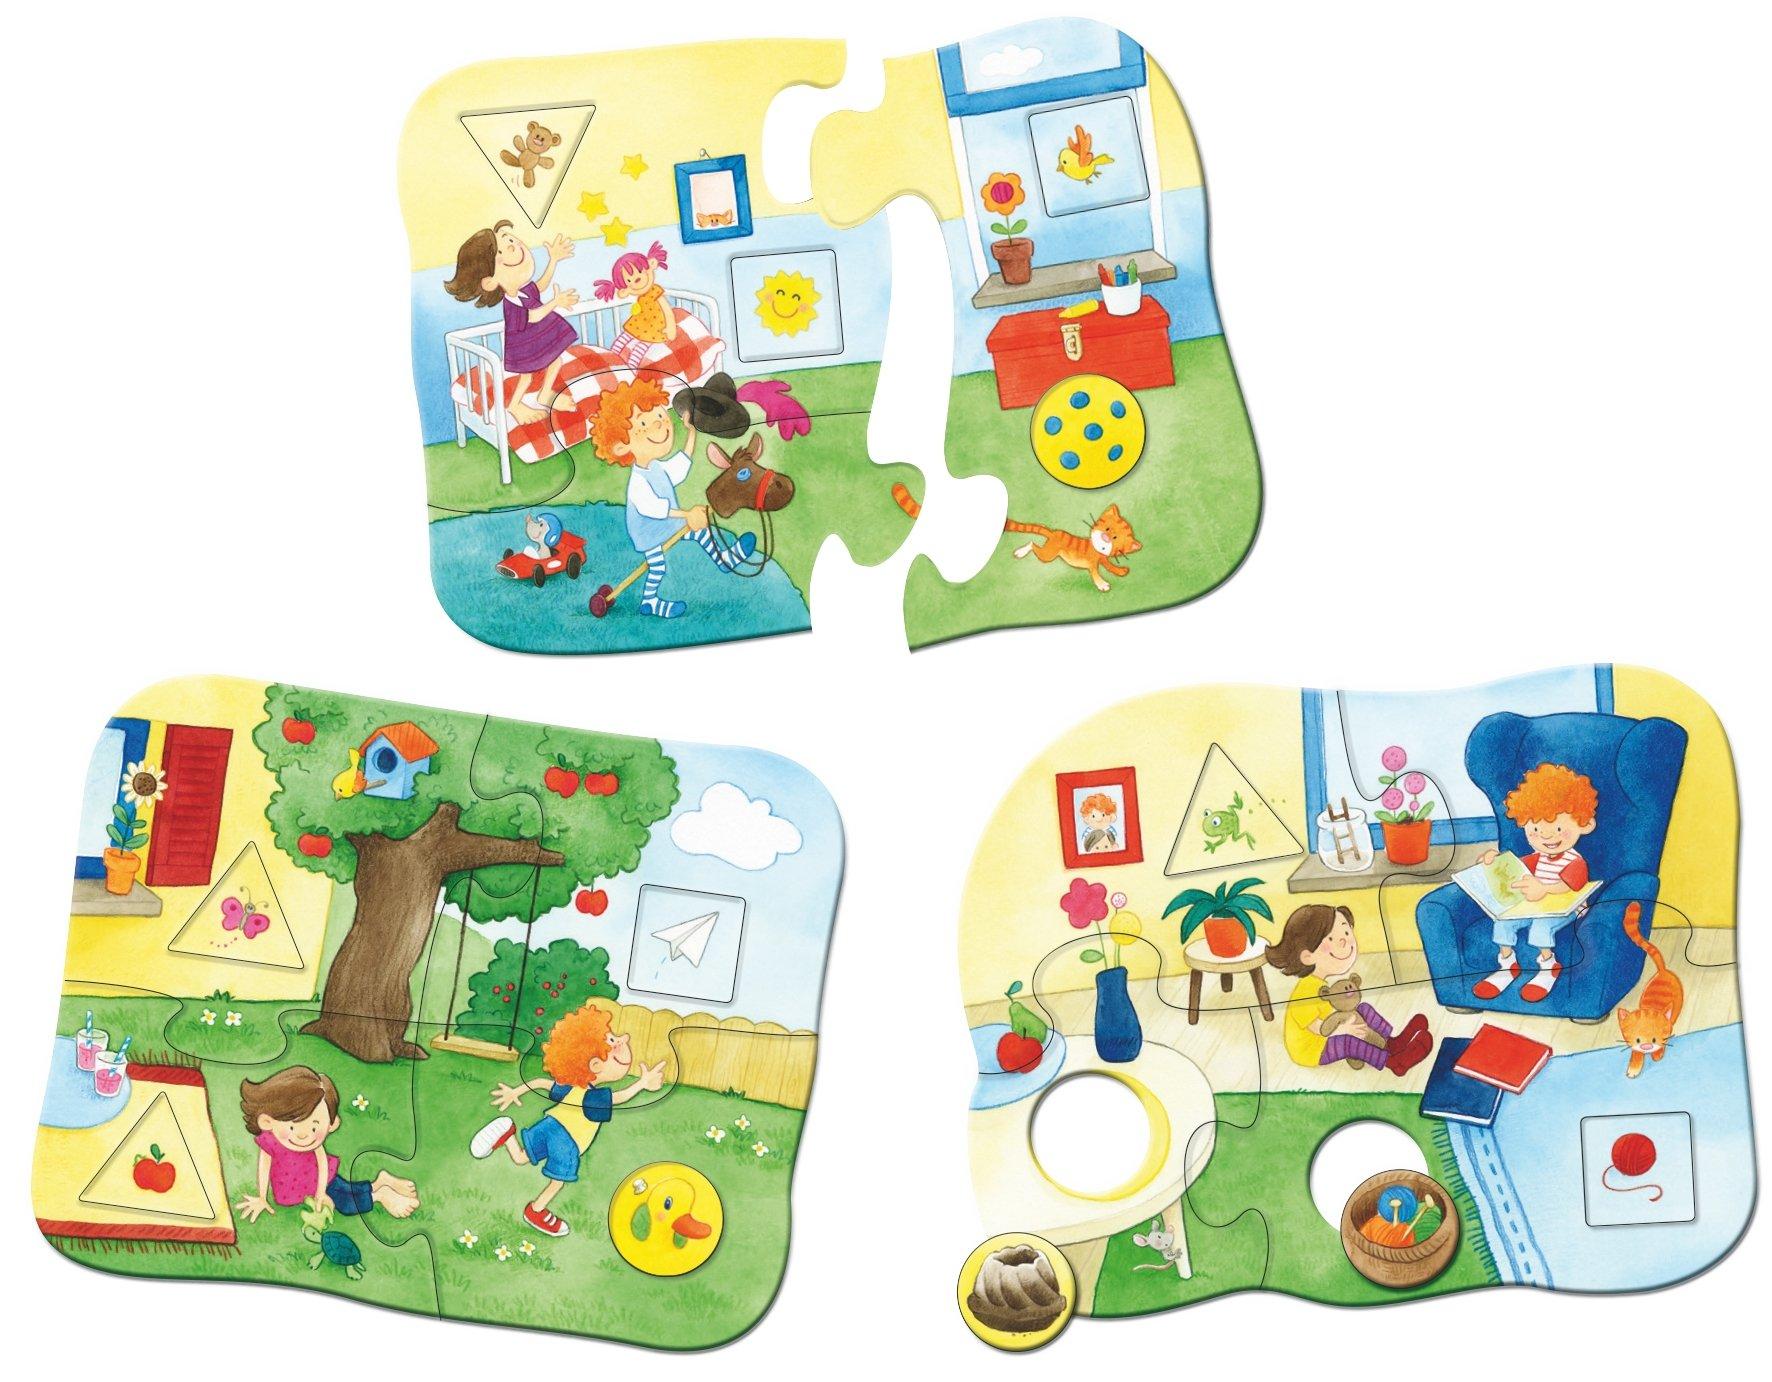 HABA 301649 Puzzle 7 pc Boy//Girl, 2 yr - Rompecabezas s 7 pc Cardboard 620 g s s